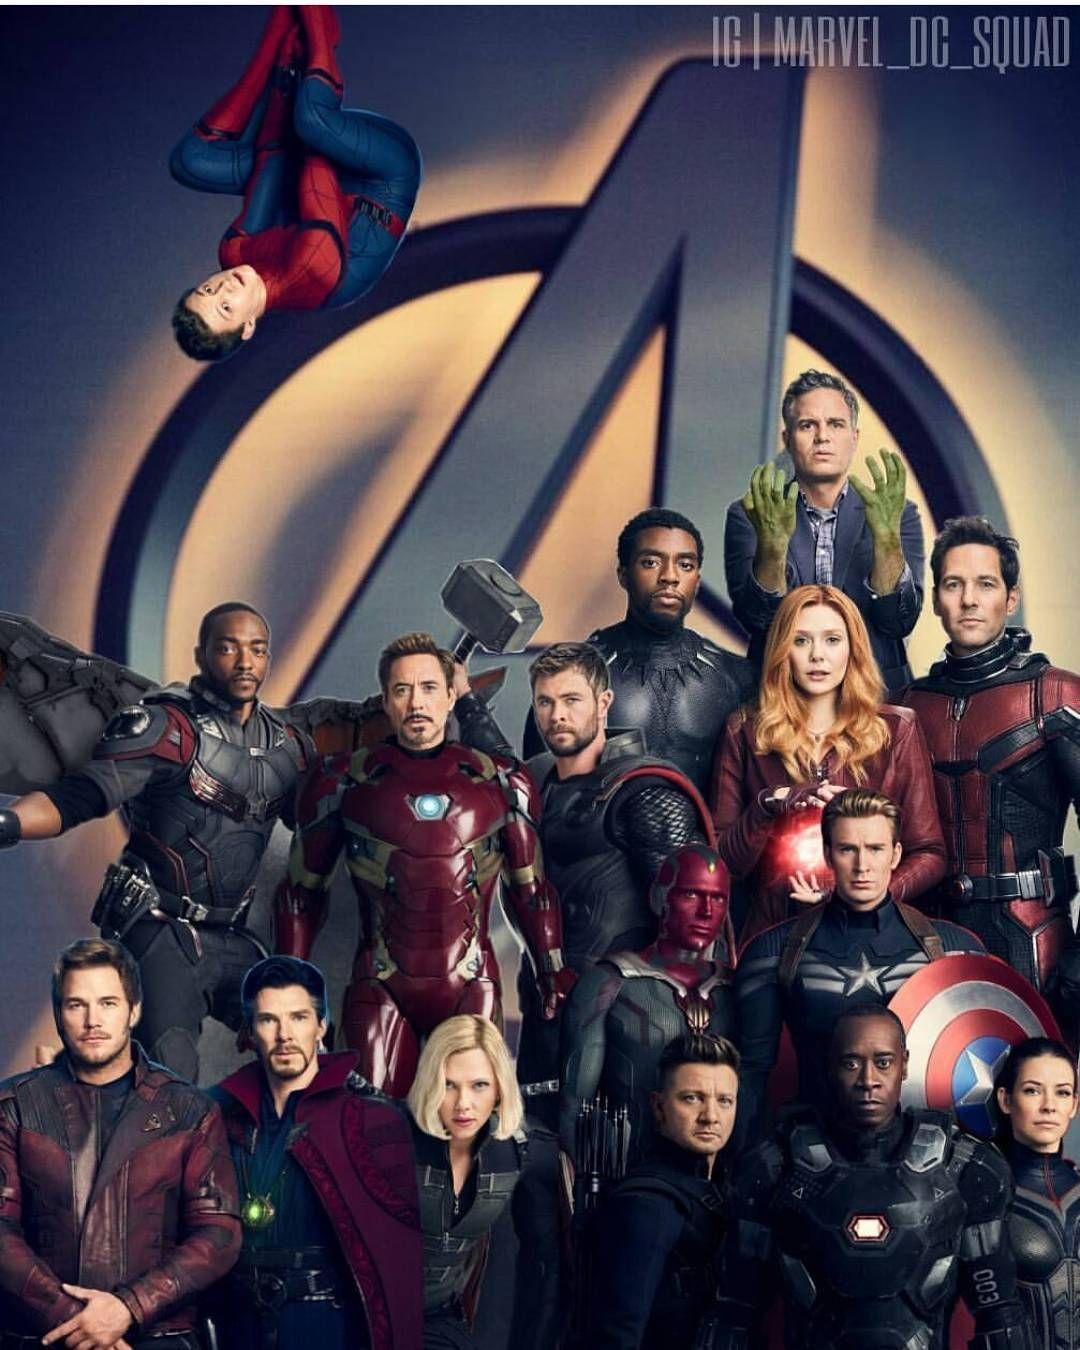 Pin De Daniella Gue Em Marvel Marvel Super Herois Vingadores E